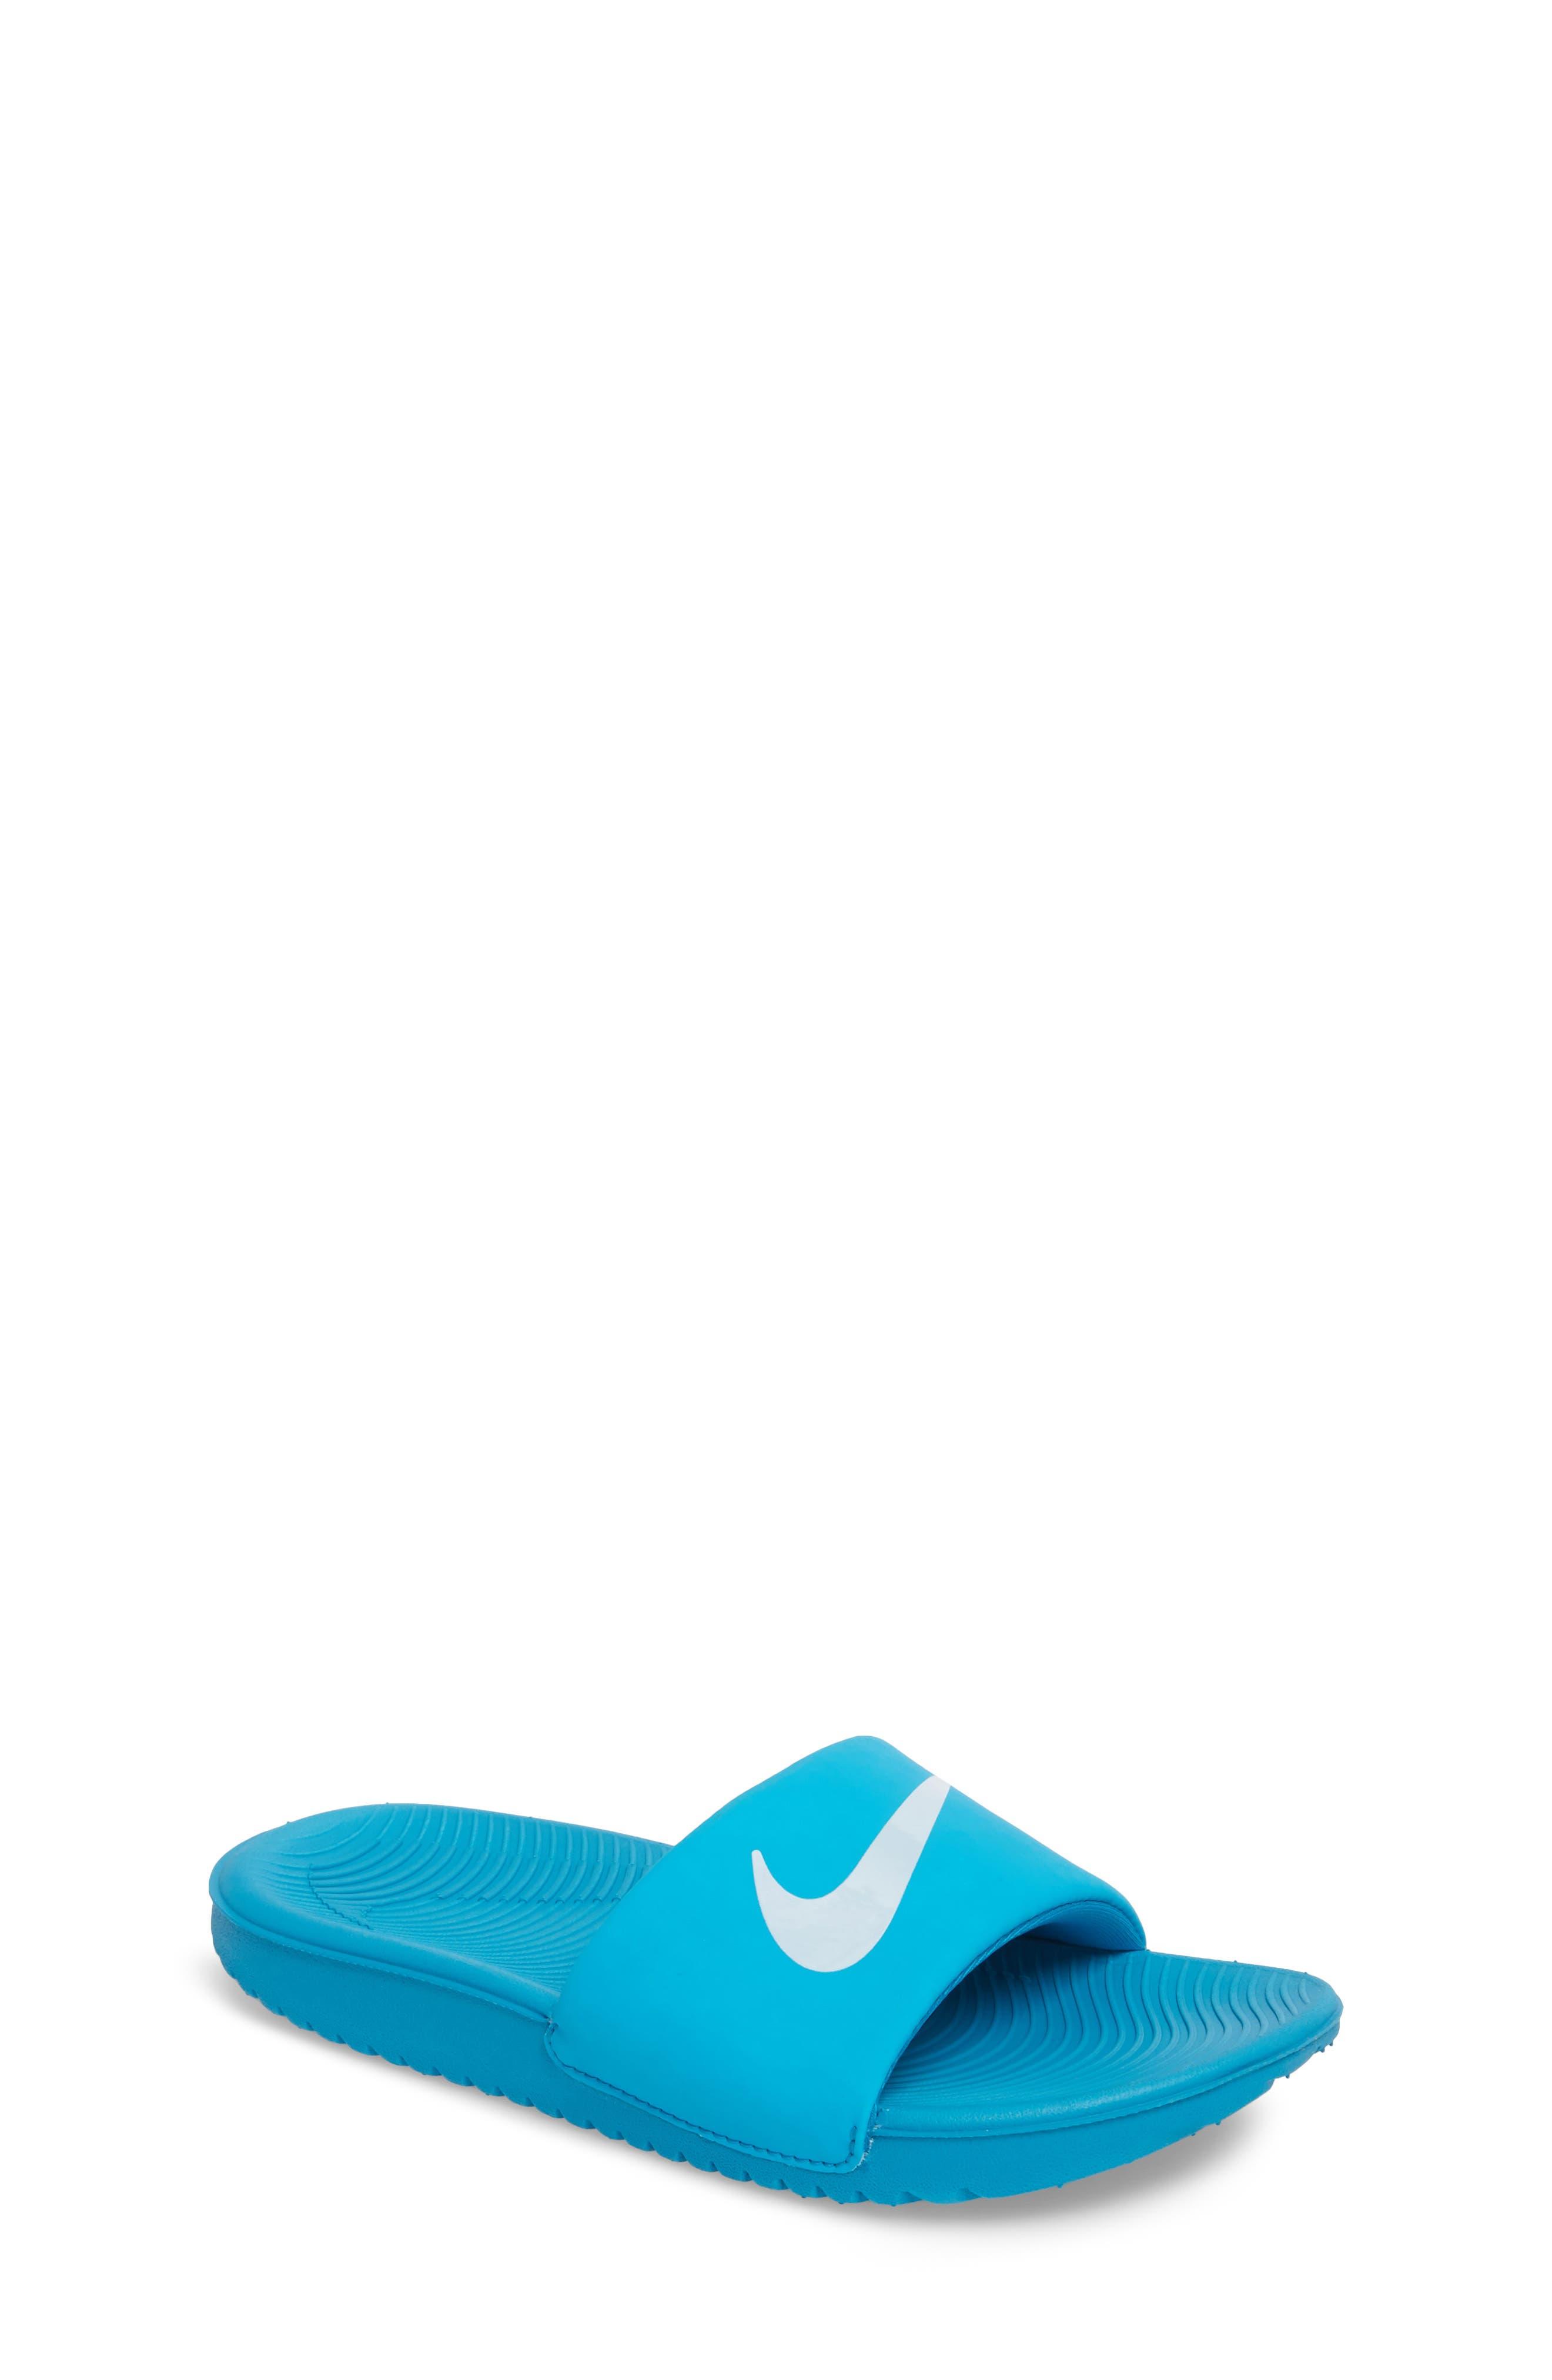 Alternate Image 1 Selected - Nike 'Kawa' Slide Sandal (Toddler, Little Kid & Big Kid)